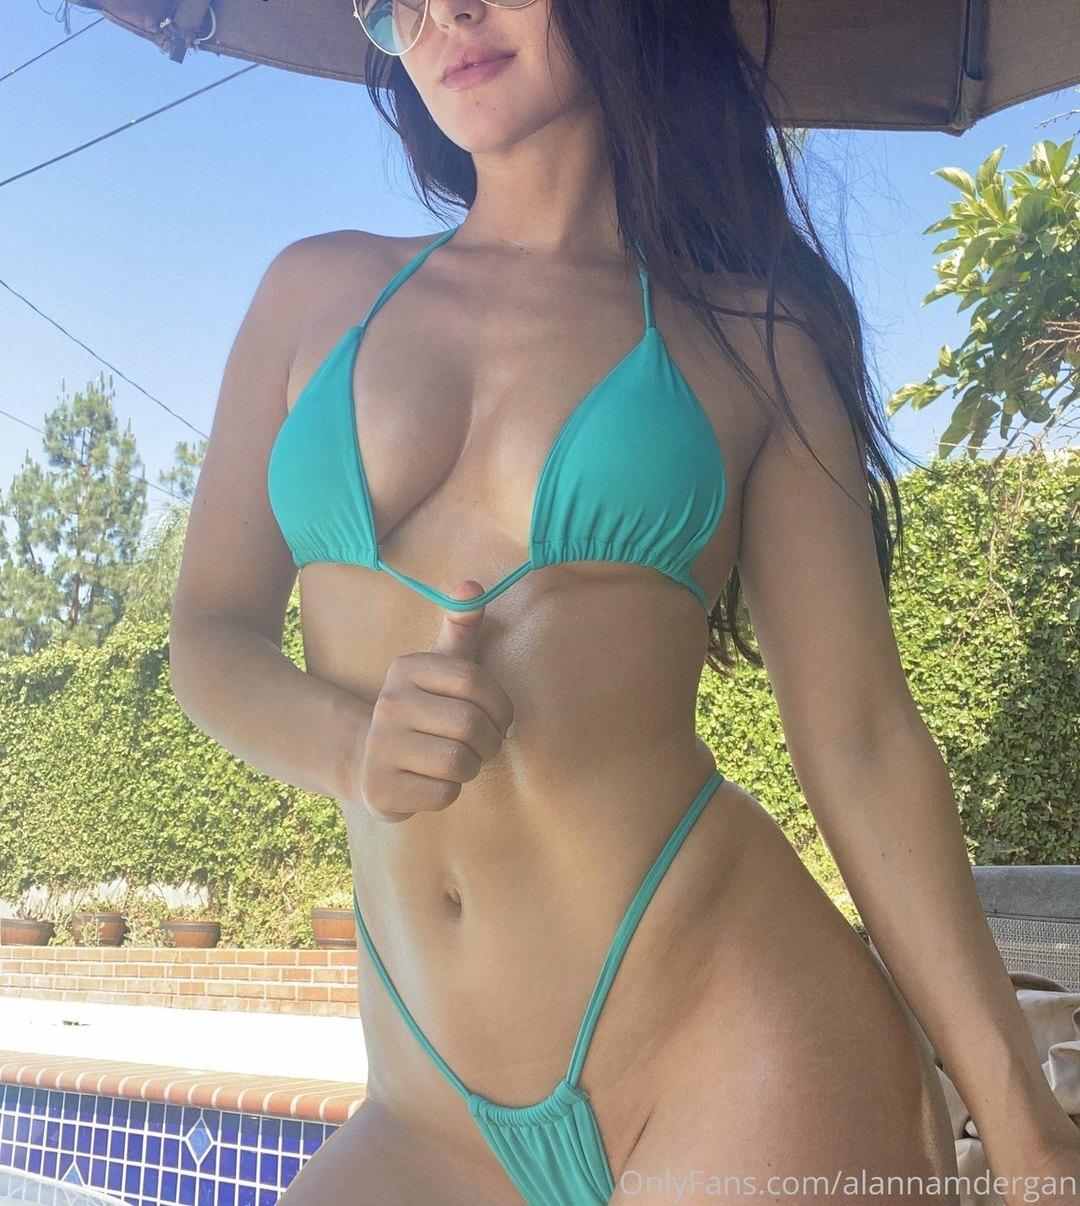 Alanna Dergan Alannnna Onlyfans Nudes Leaks 0051